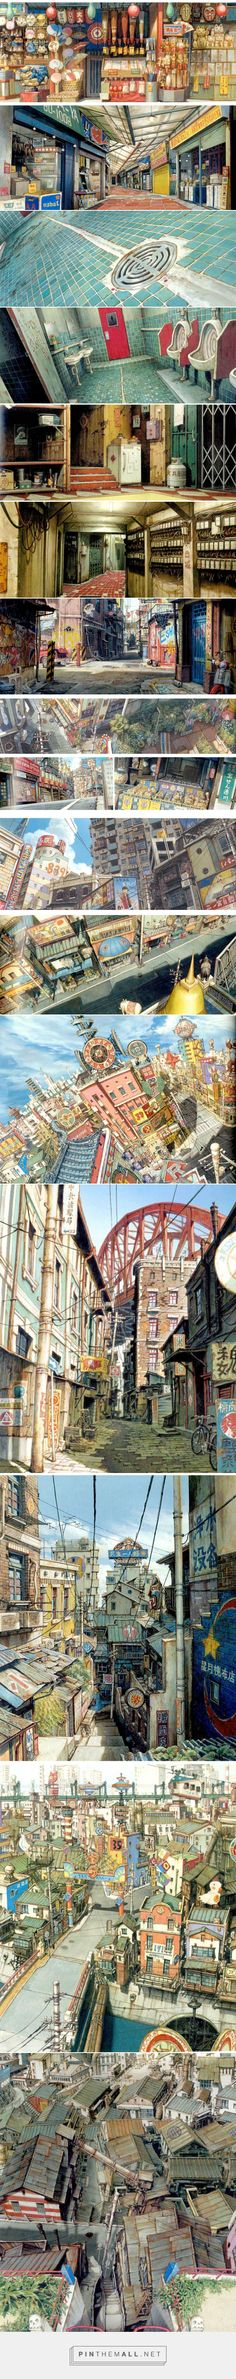 de TekkonKinkreet | THECAB - The Concept Art Blog - created via http://pinthemall.net